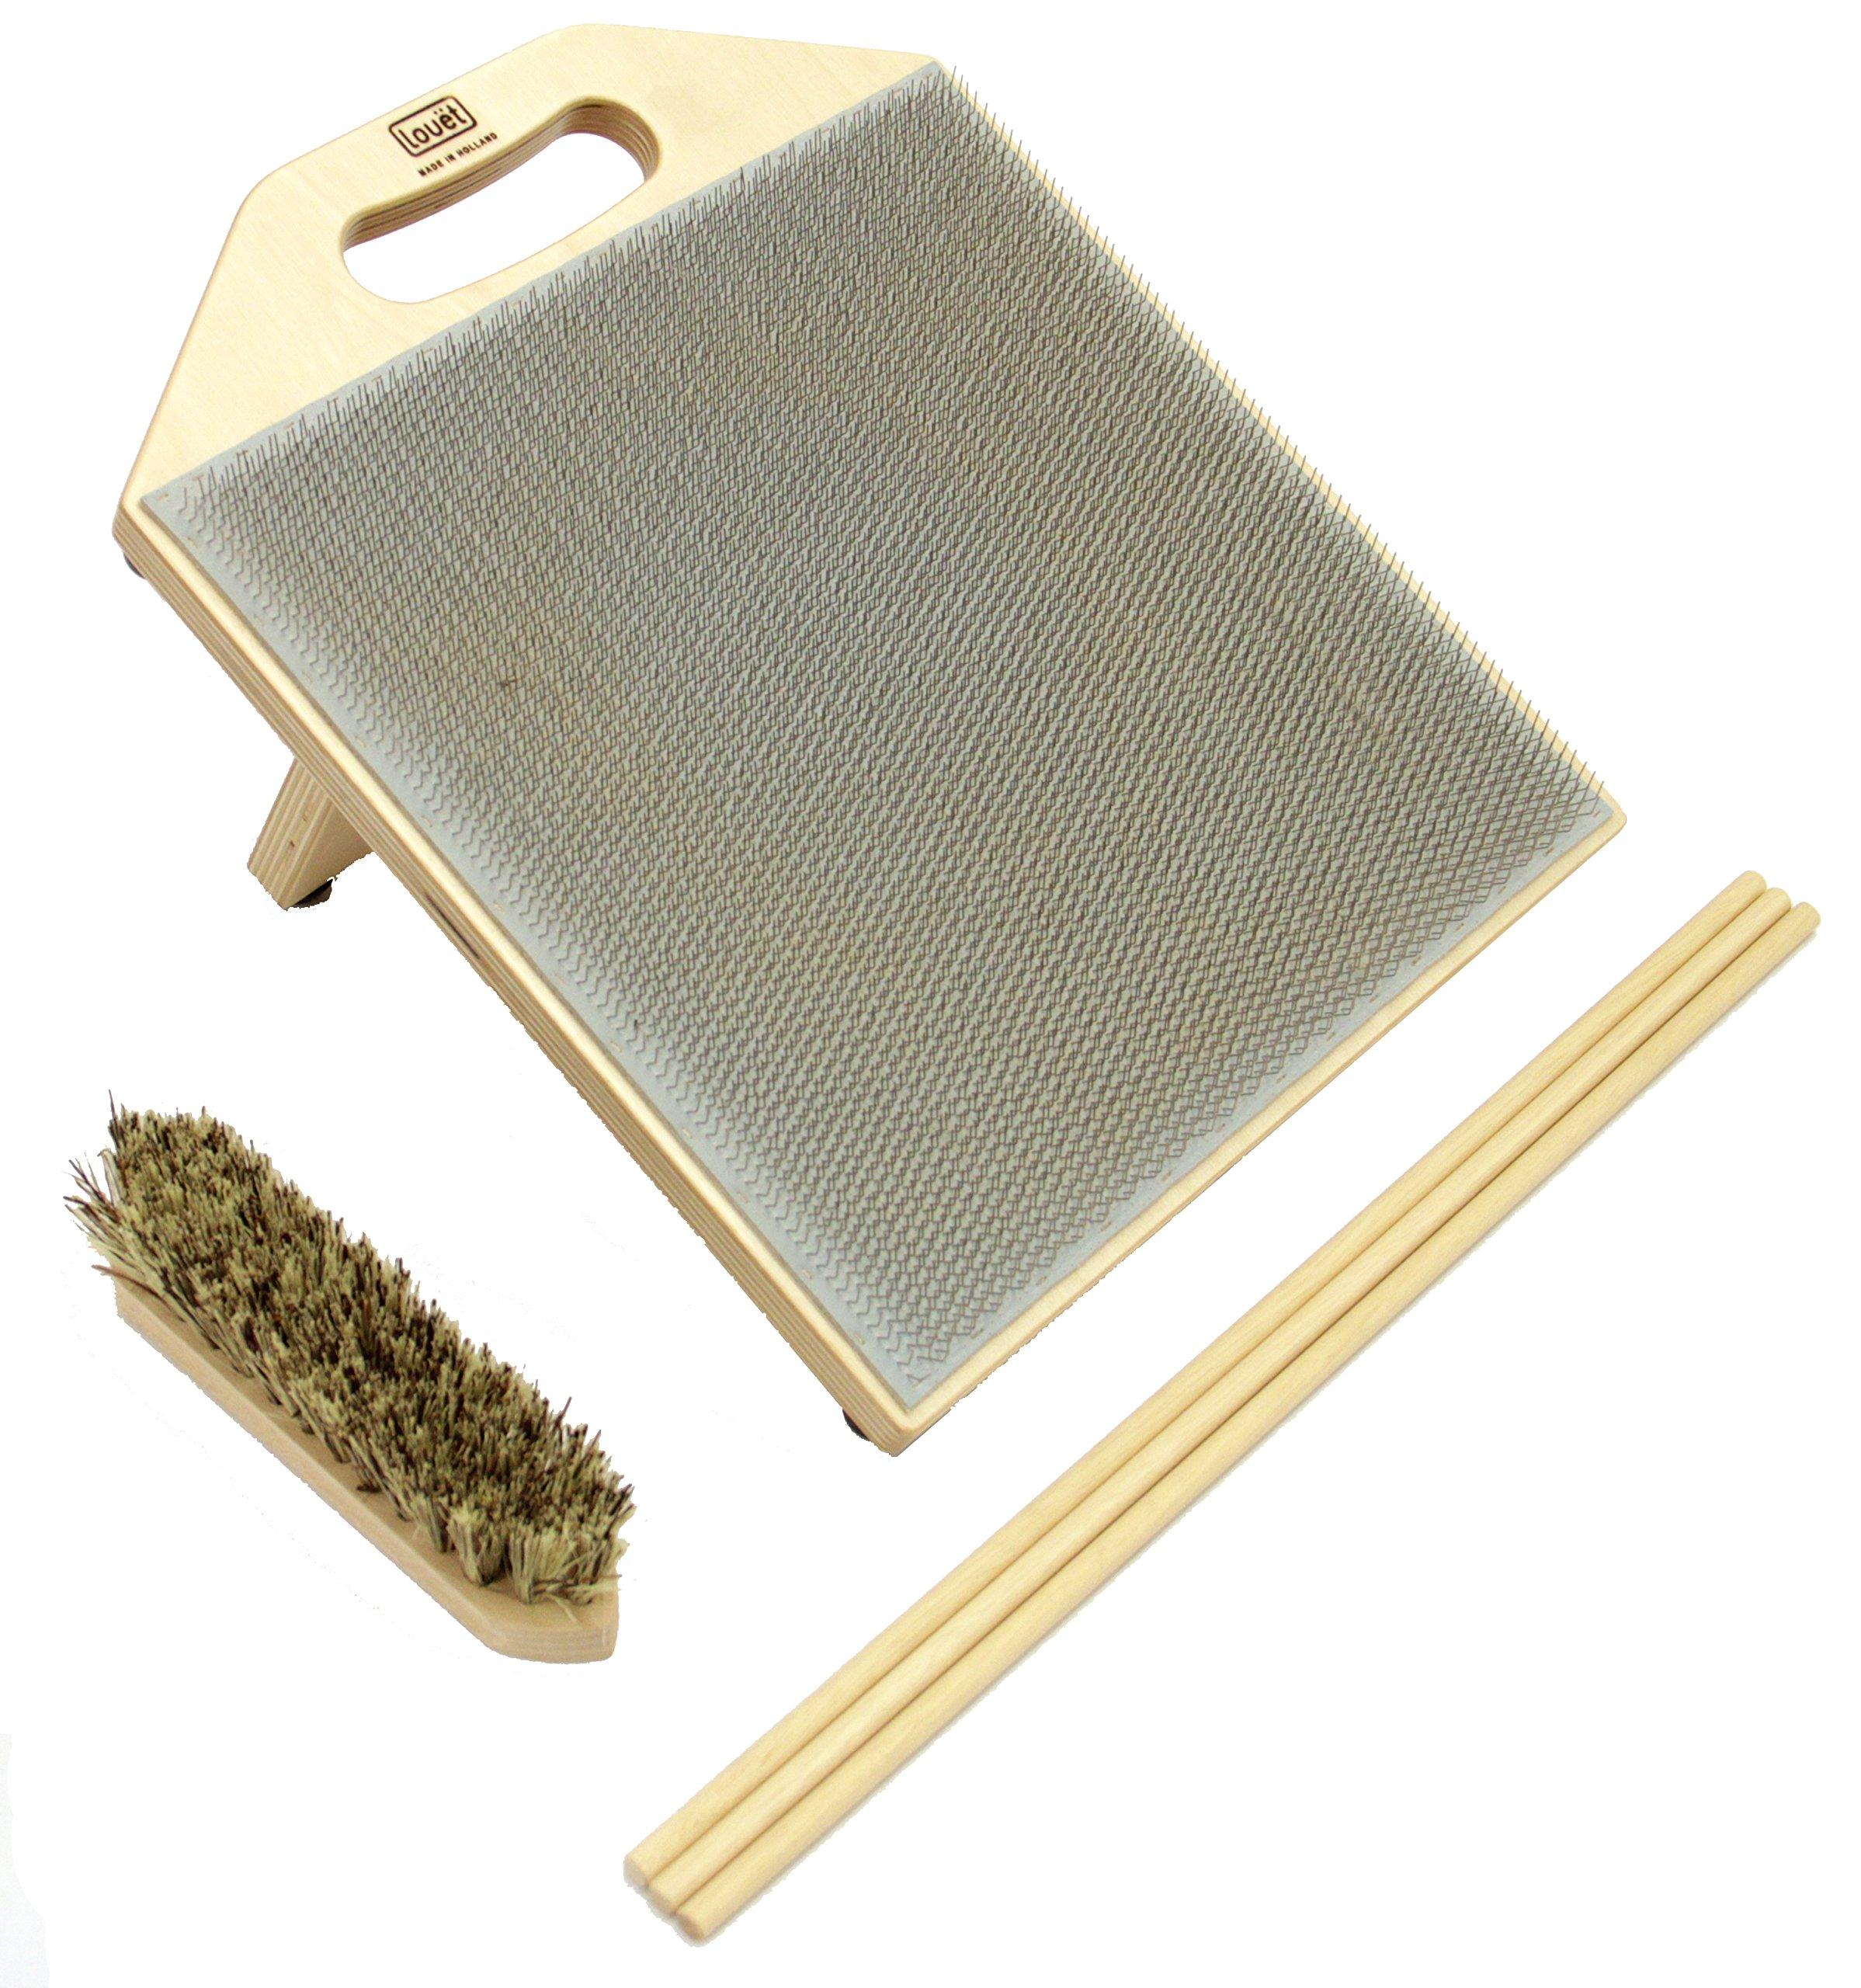 Louet Blending Board for Spinning Fiber Preparation by Louet